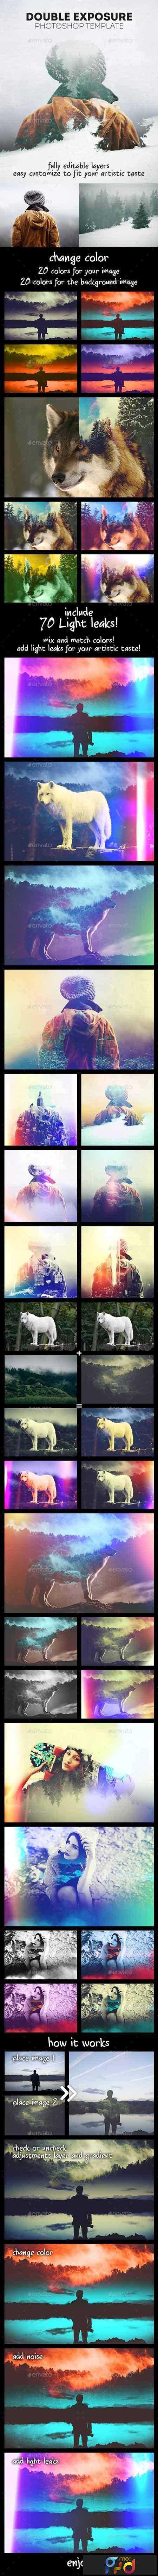 freepsdvn-com_1474476306_double-exposure-photoshop-template-17075830